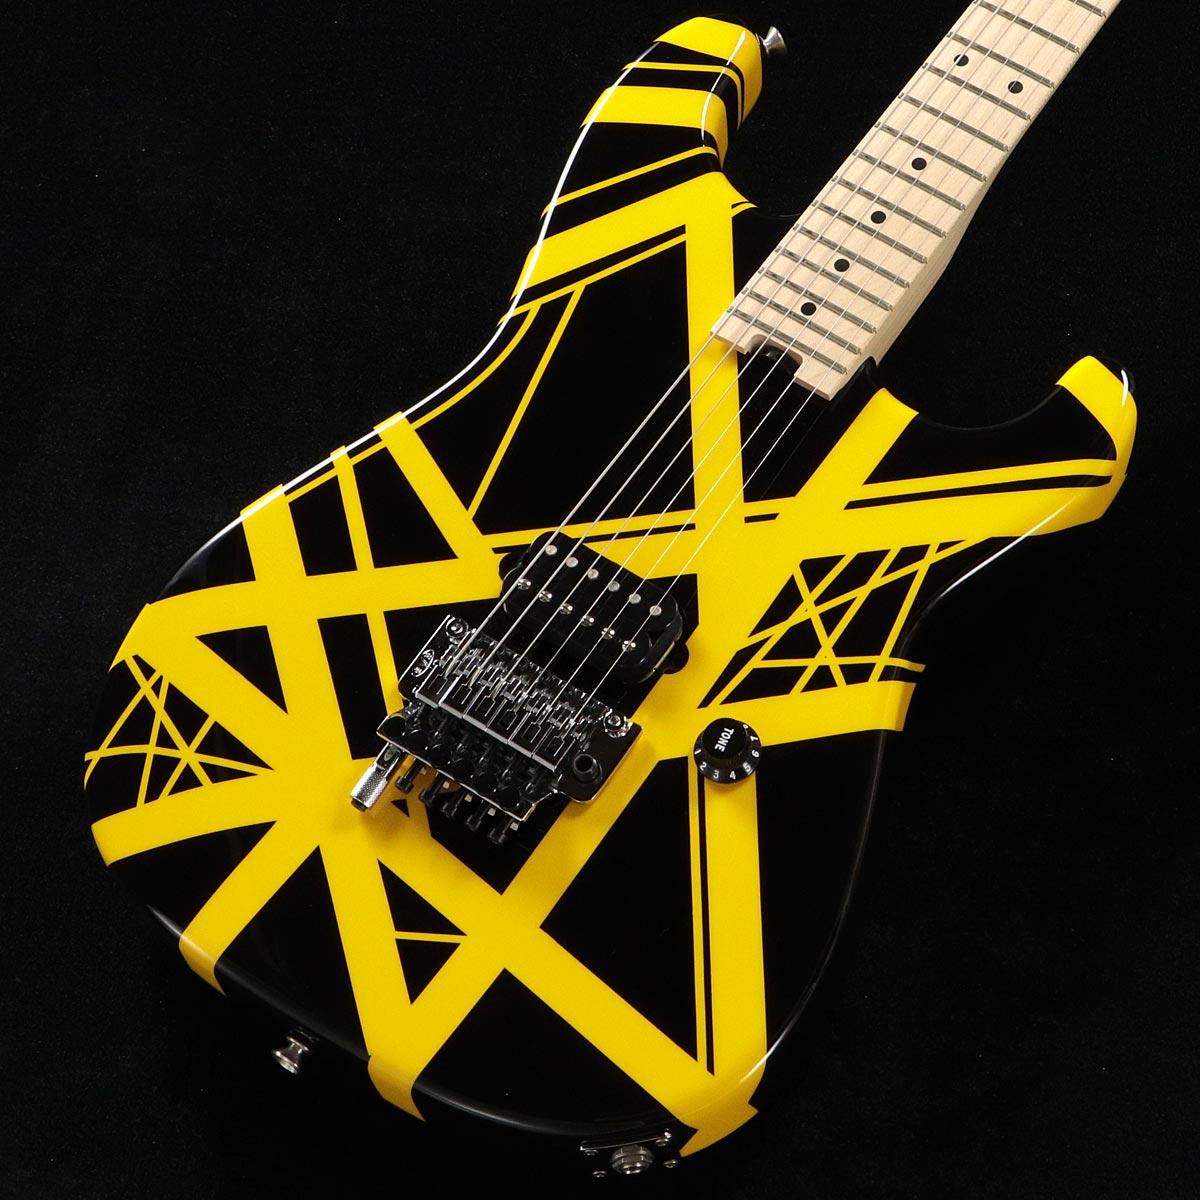 EVH /Striped Series Black with Yellow Stripes【チョイキズアウトレット特価】 イーブイエイチ【渋谷店】